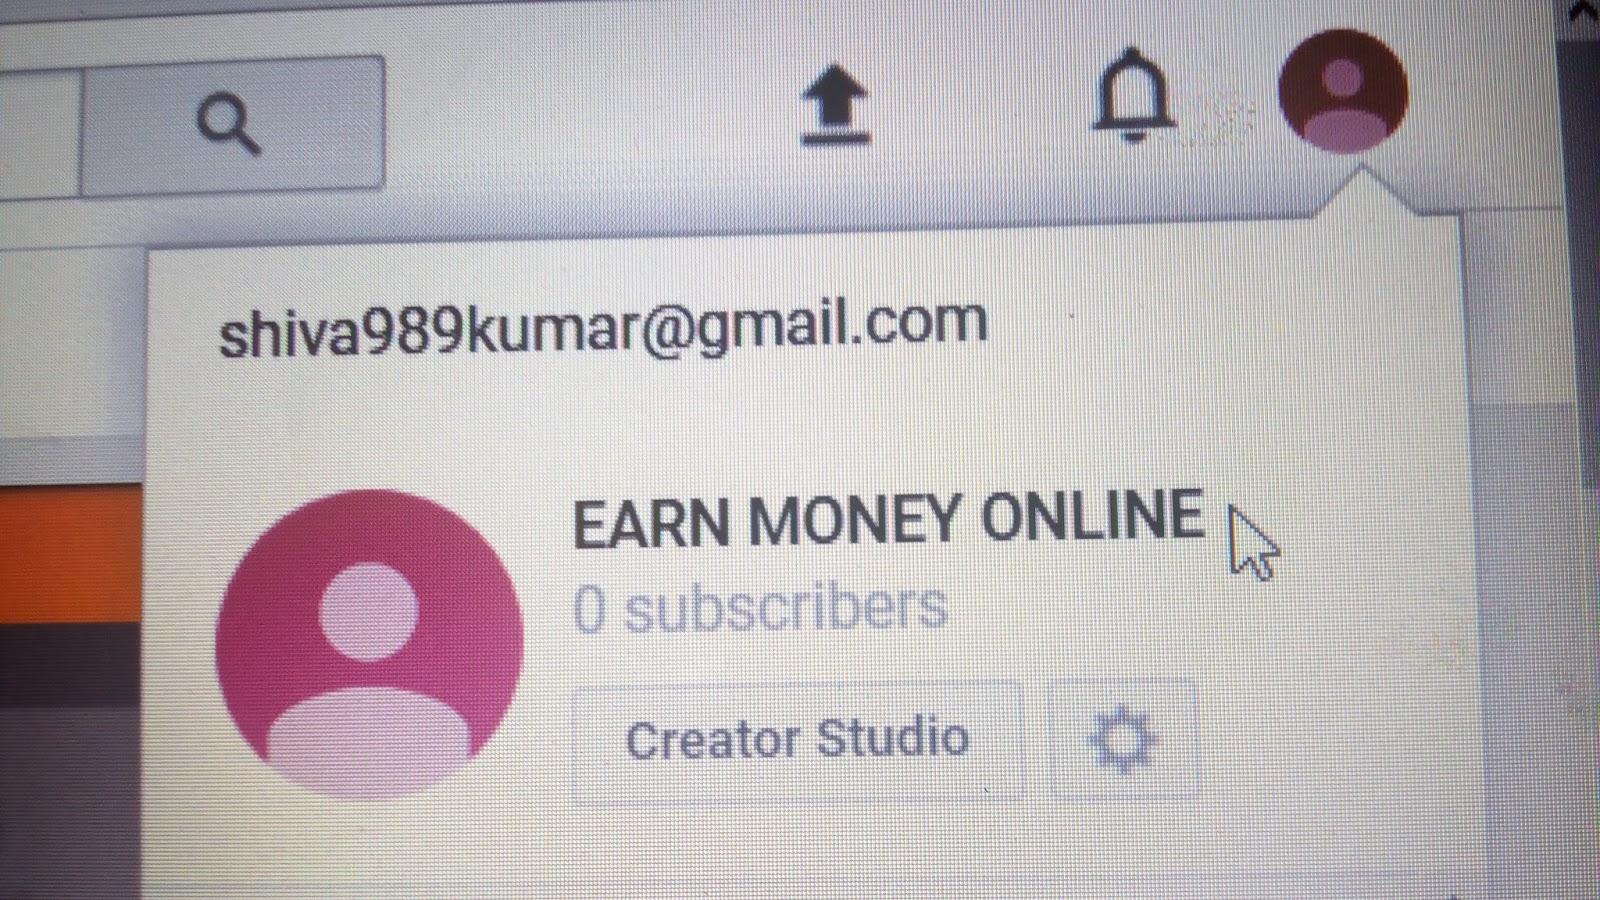 EARN MONEY ONLINE NOT TO GET RICH